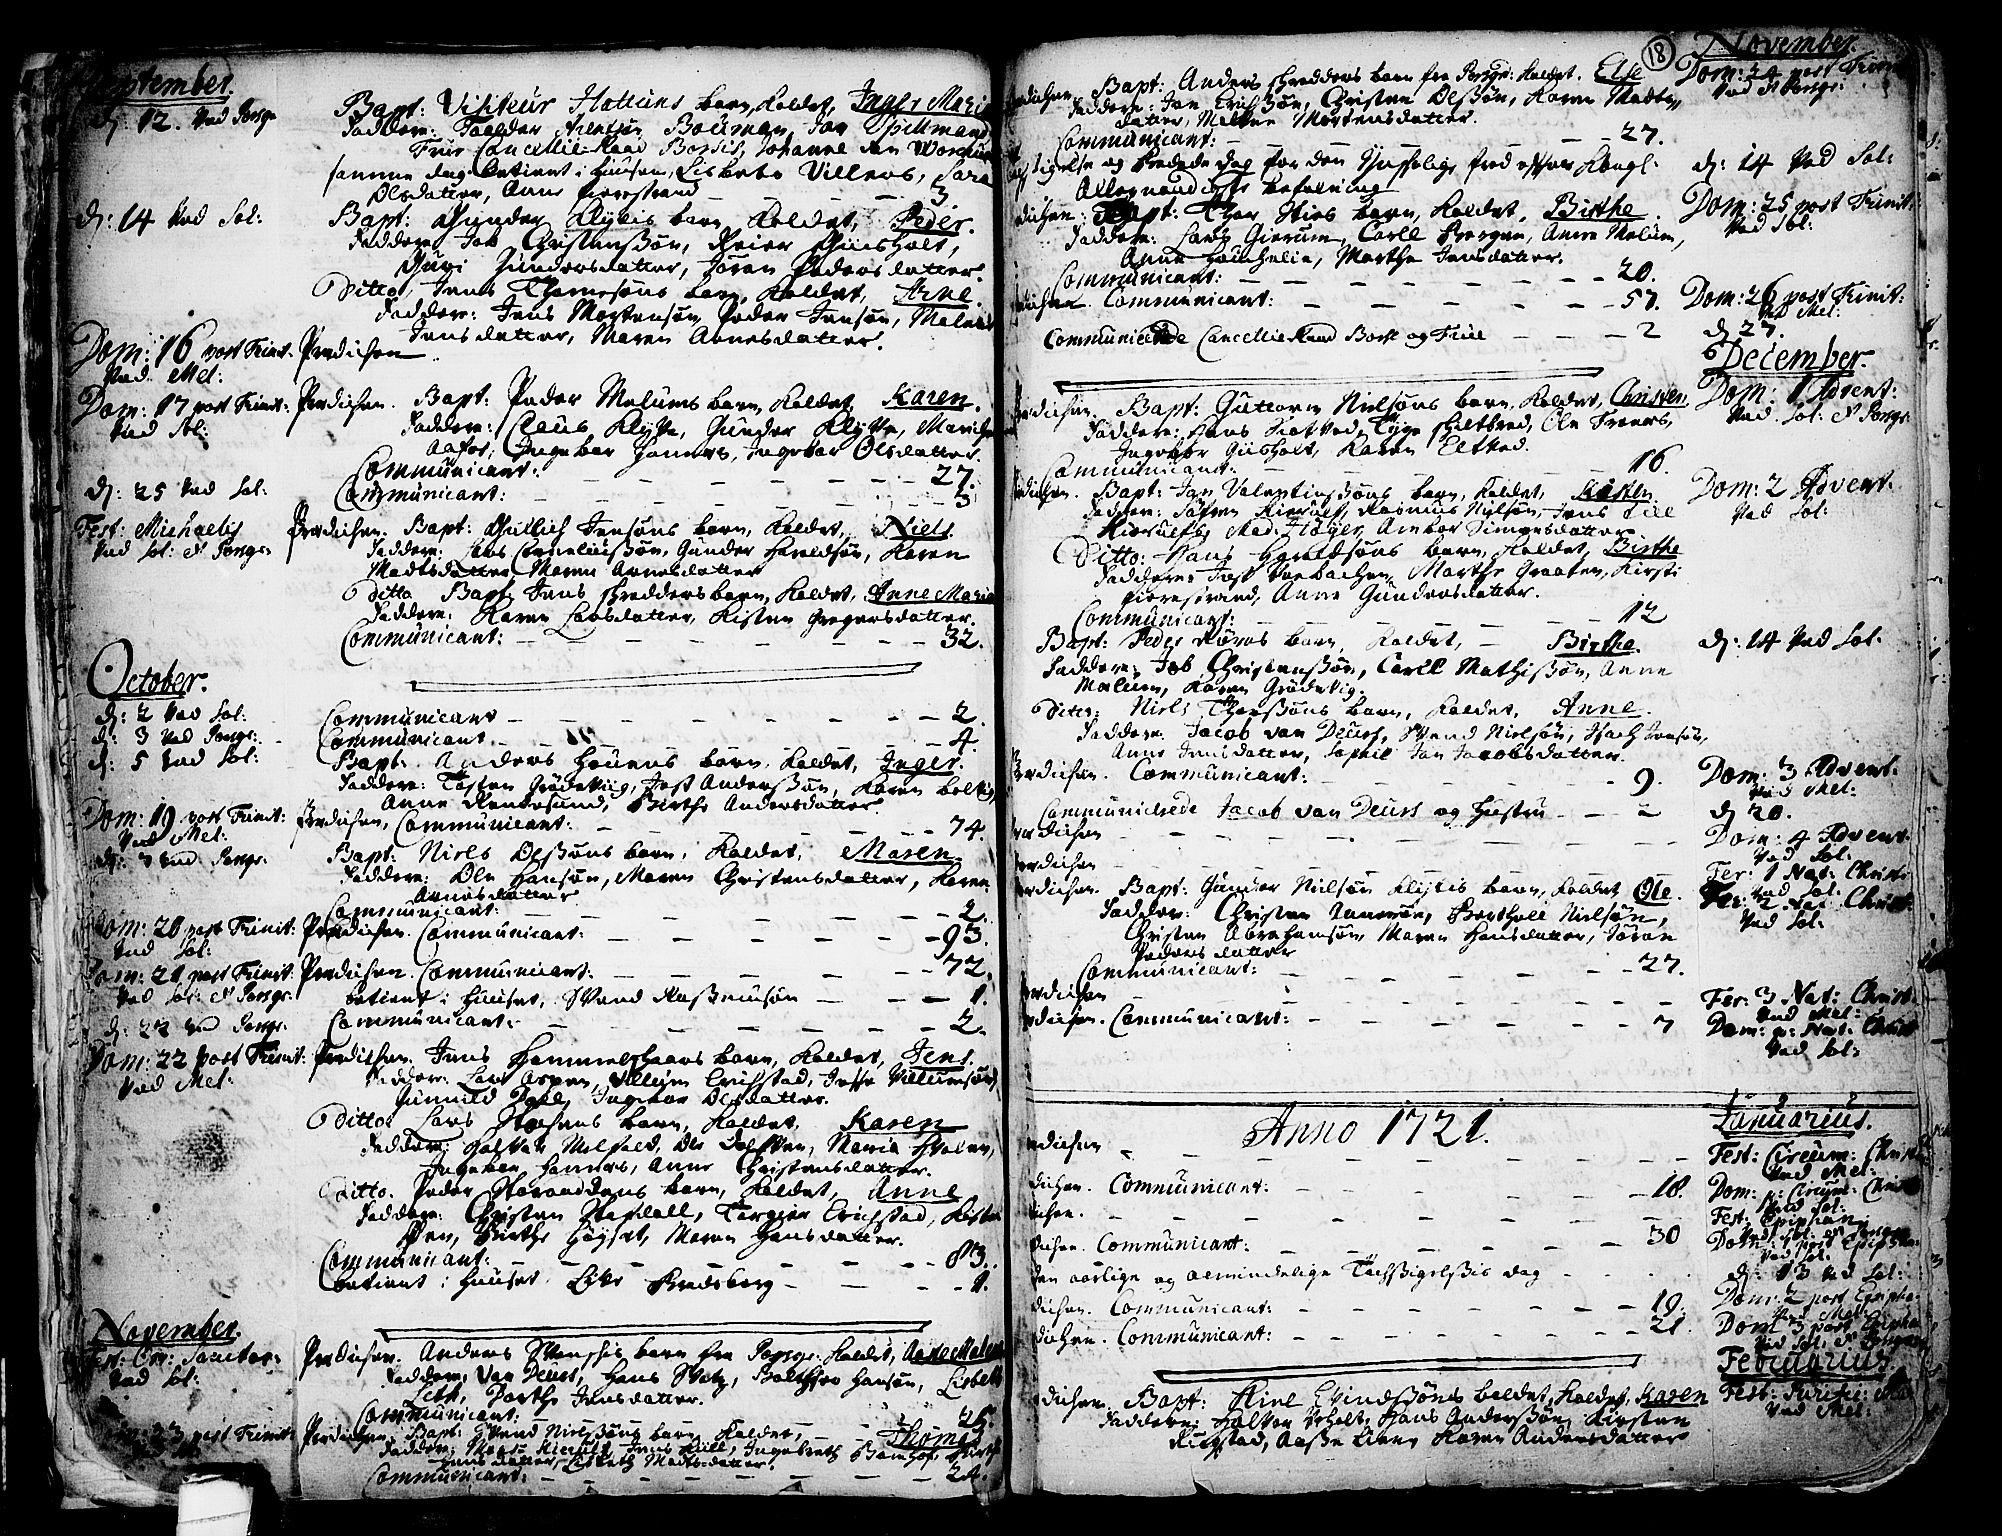 SAKO, Solum kirkebøker, F/Fa/L0002: Ministerialbok nr. I 2, 1713-1761, s. 18